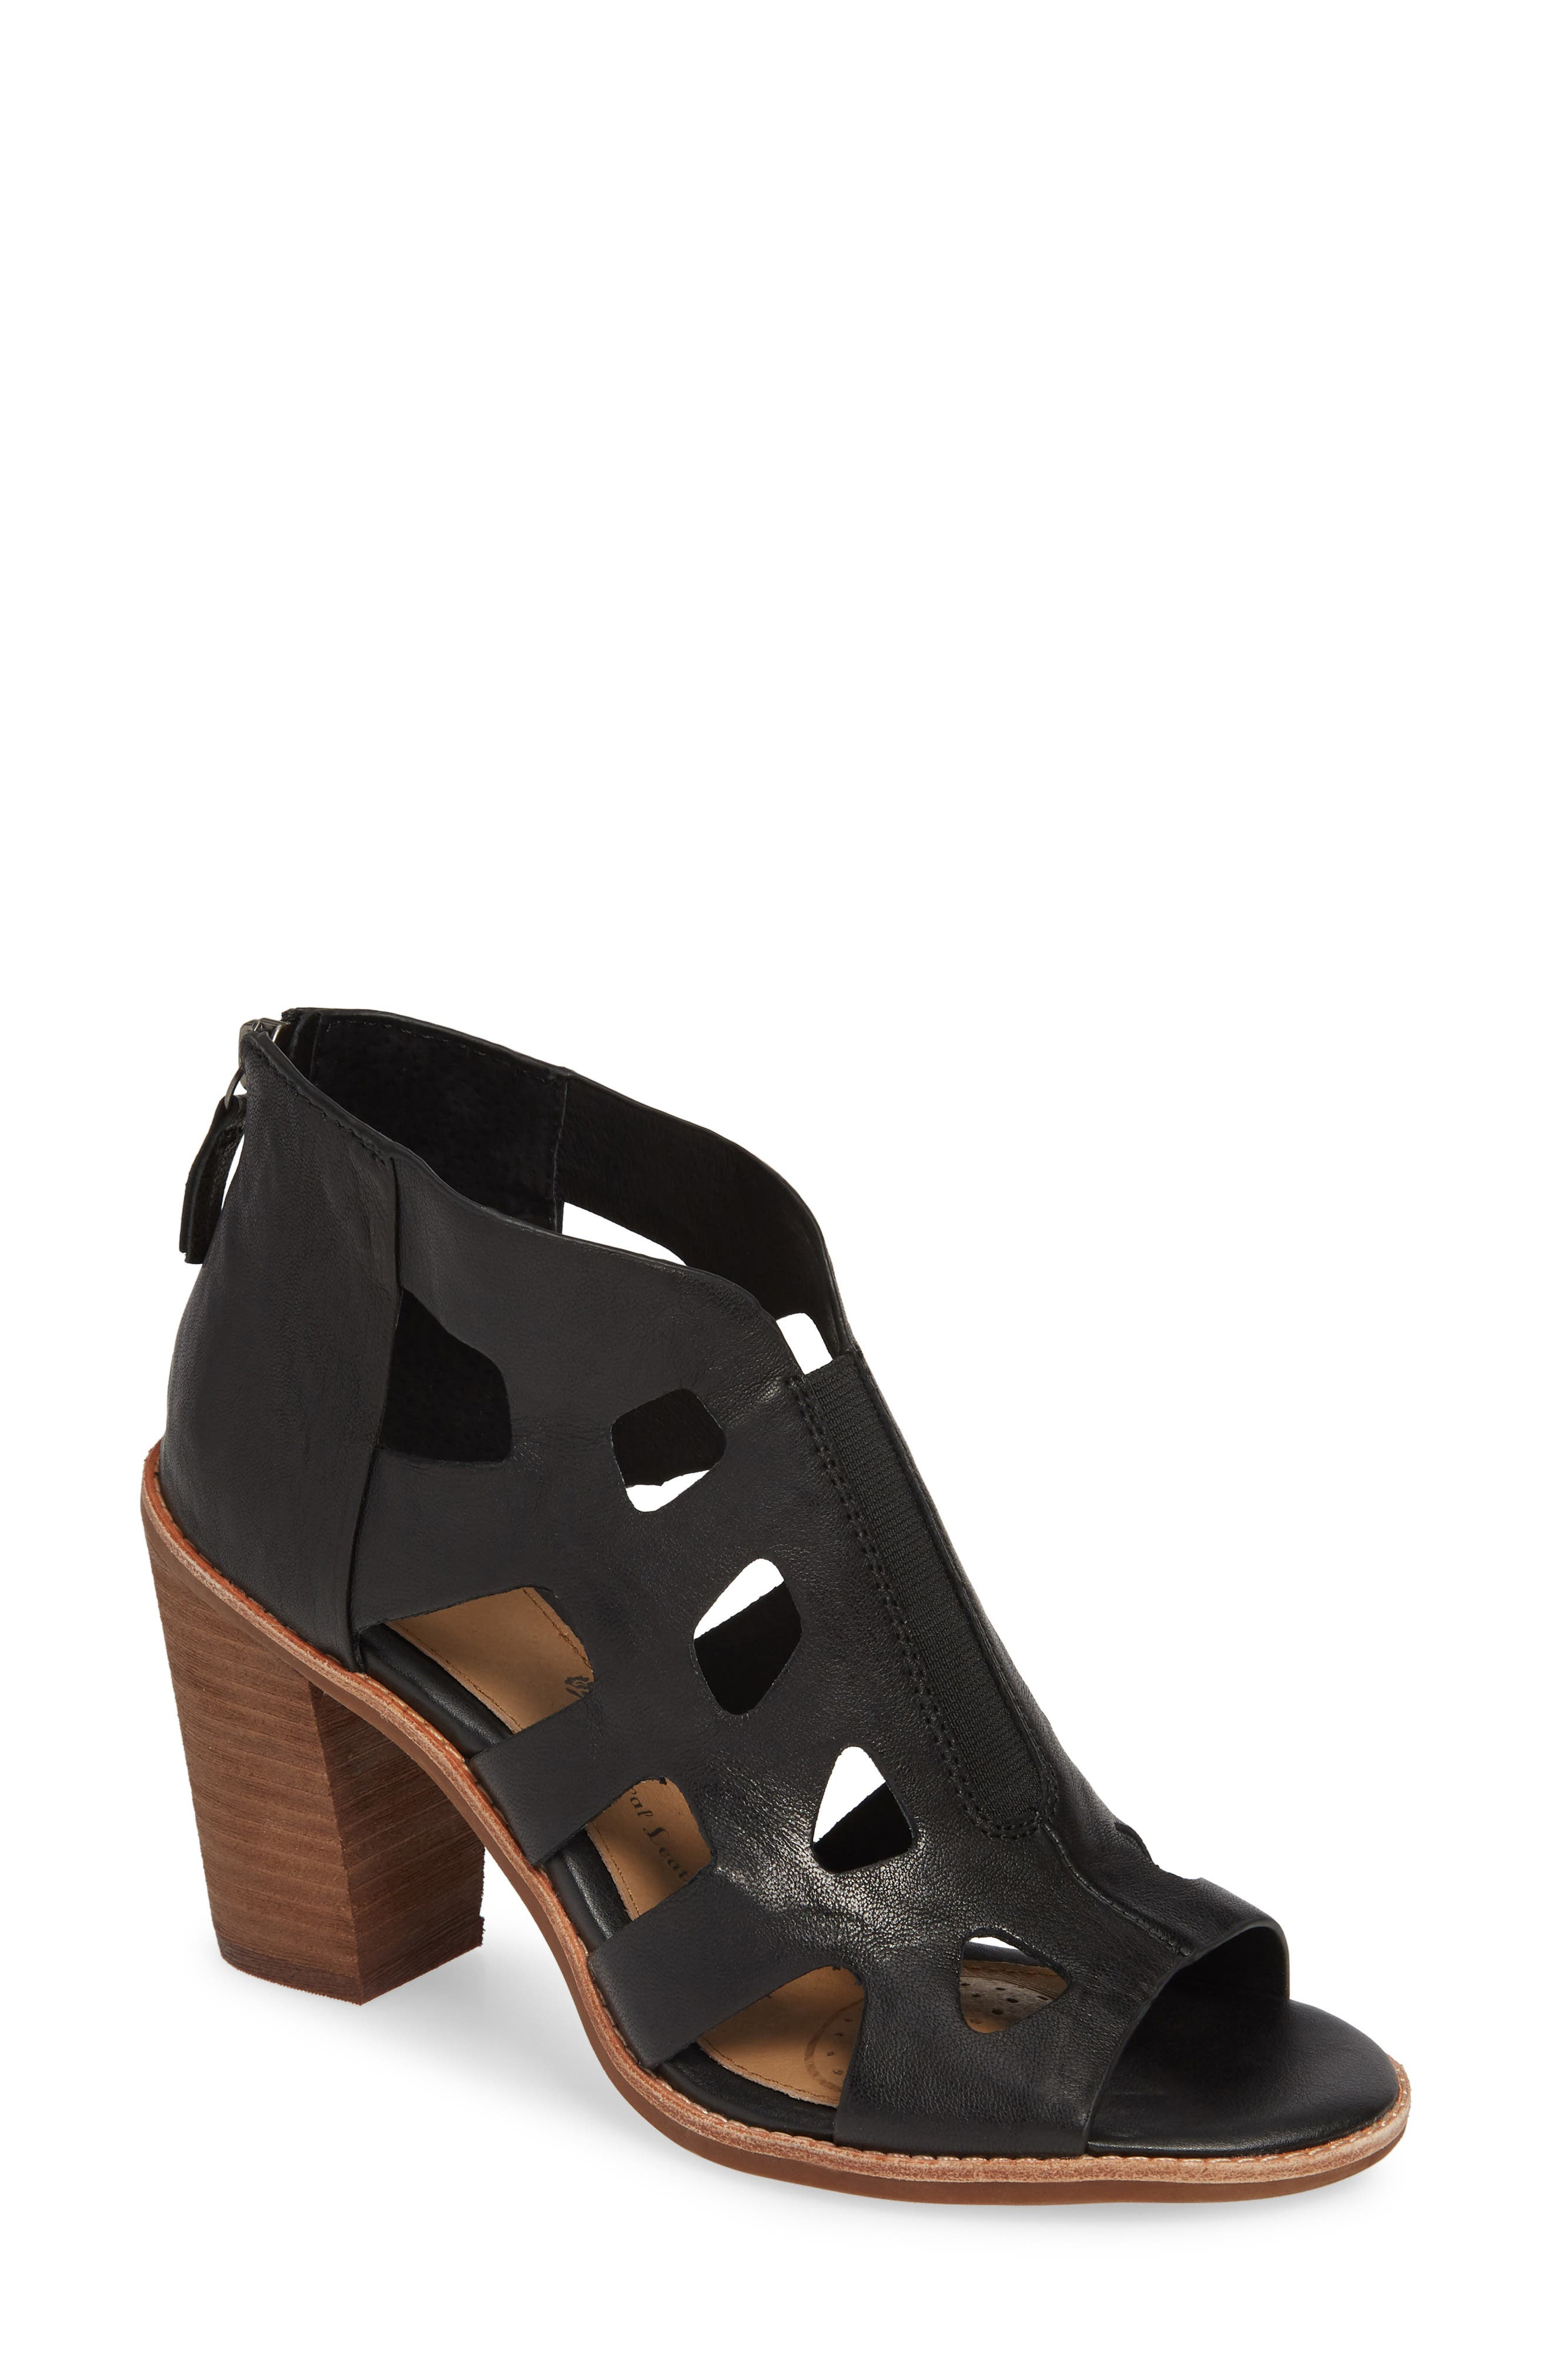 91a7d8b7f33 Sofft Pazia Block Heel Sandal